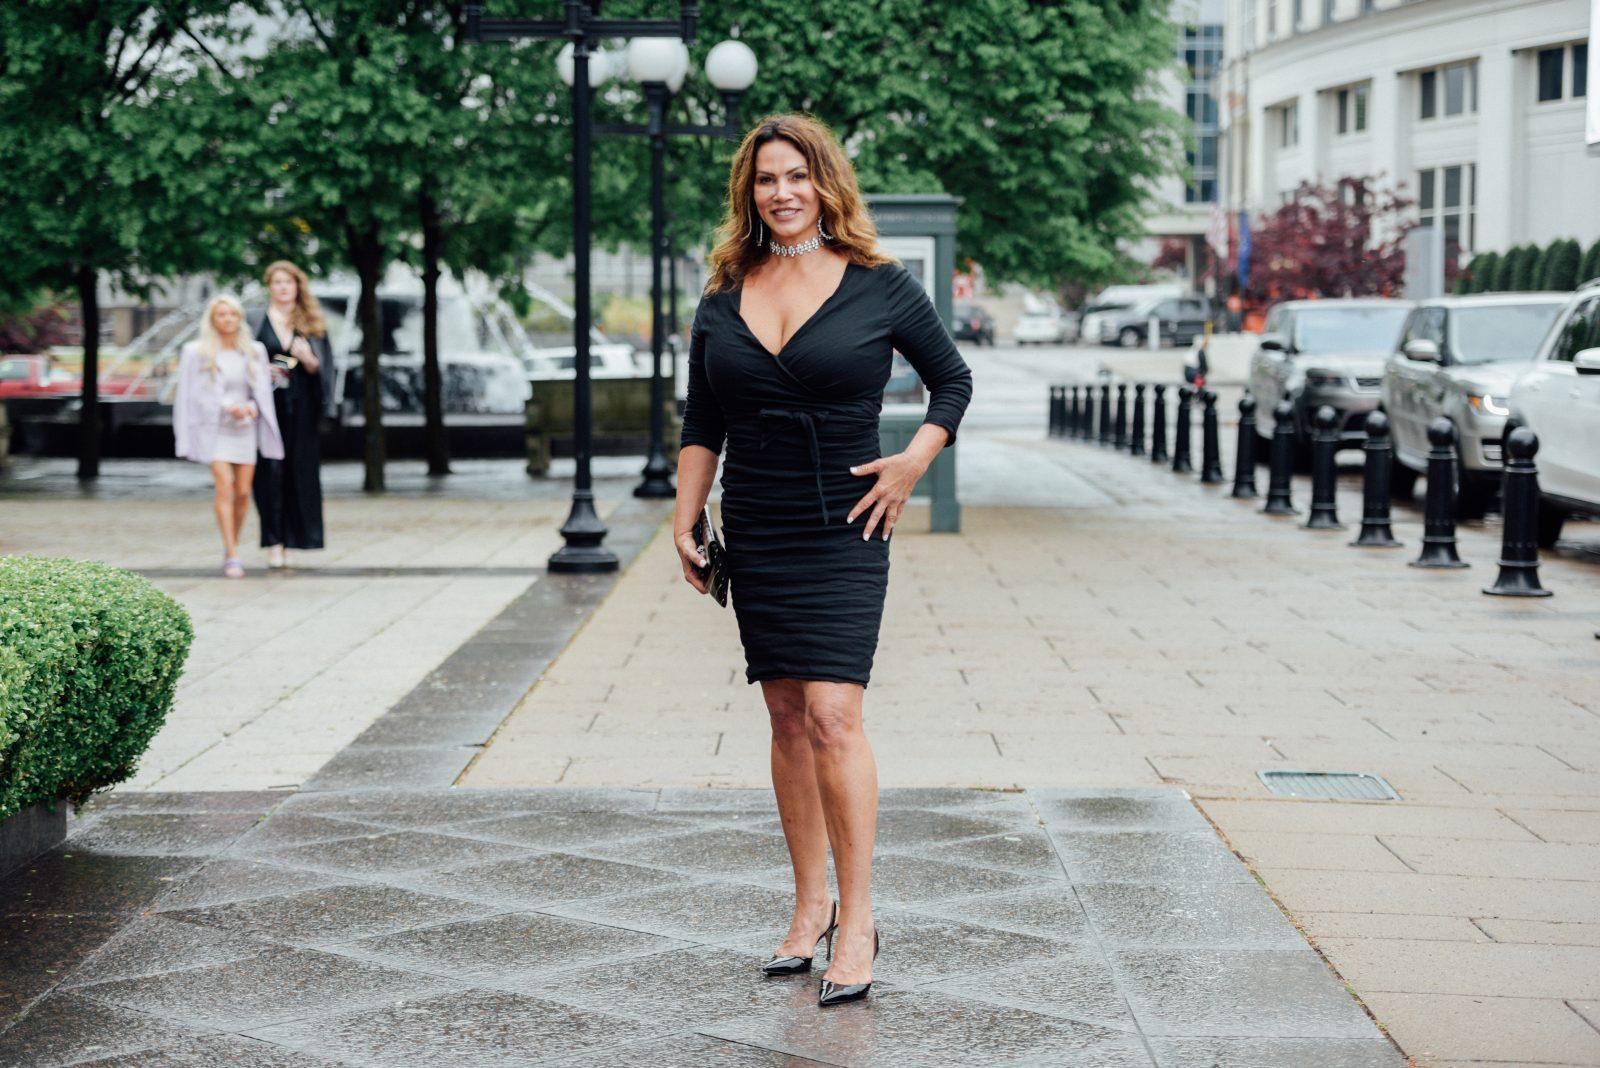 Irma Harris wearing Nicole Miller brand